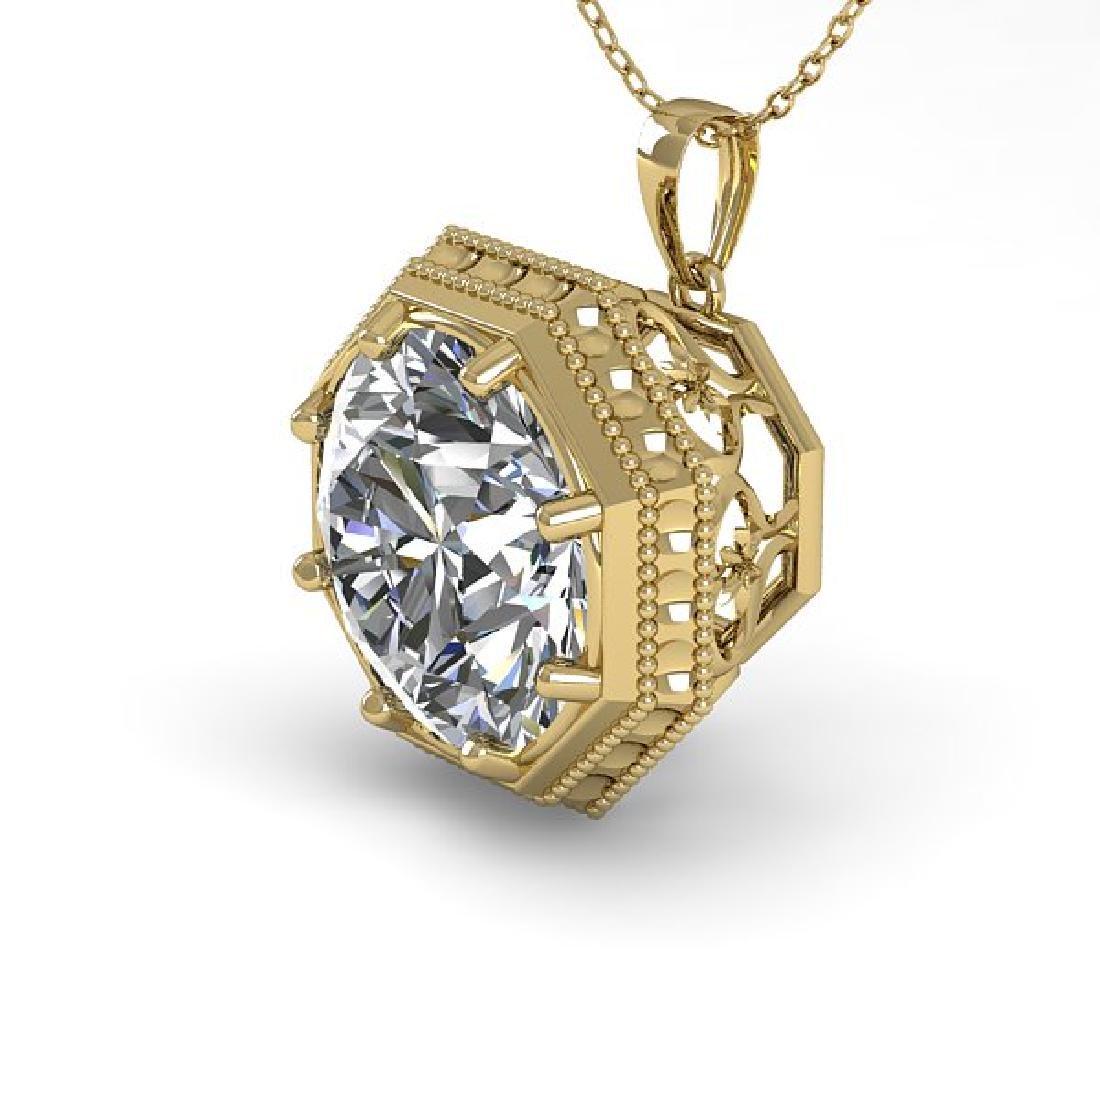 1.50 CTW VS/SI Diamond Solitaire Necklace 14K Yellow